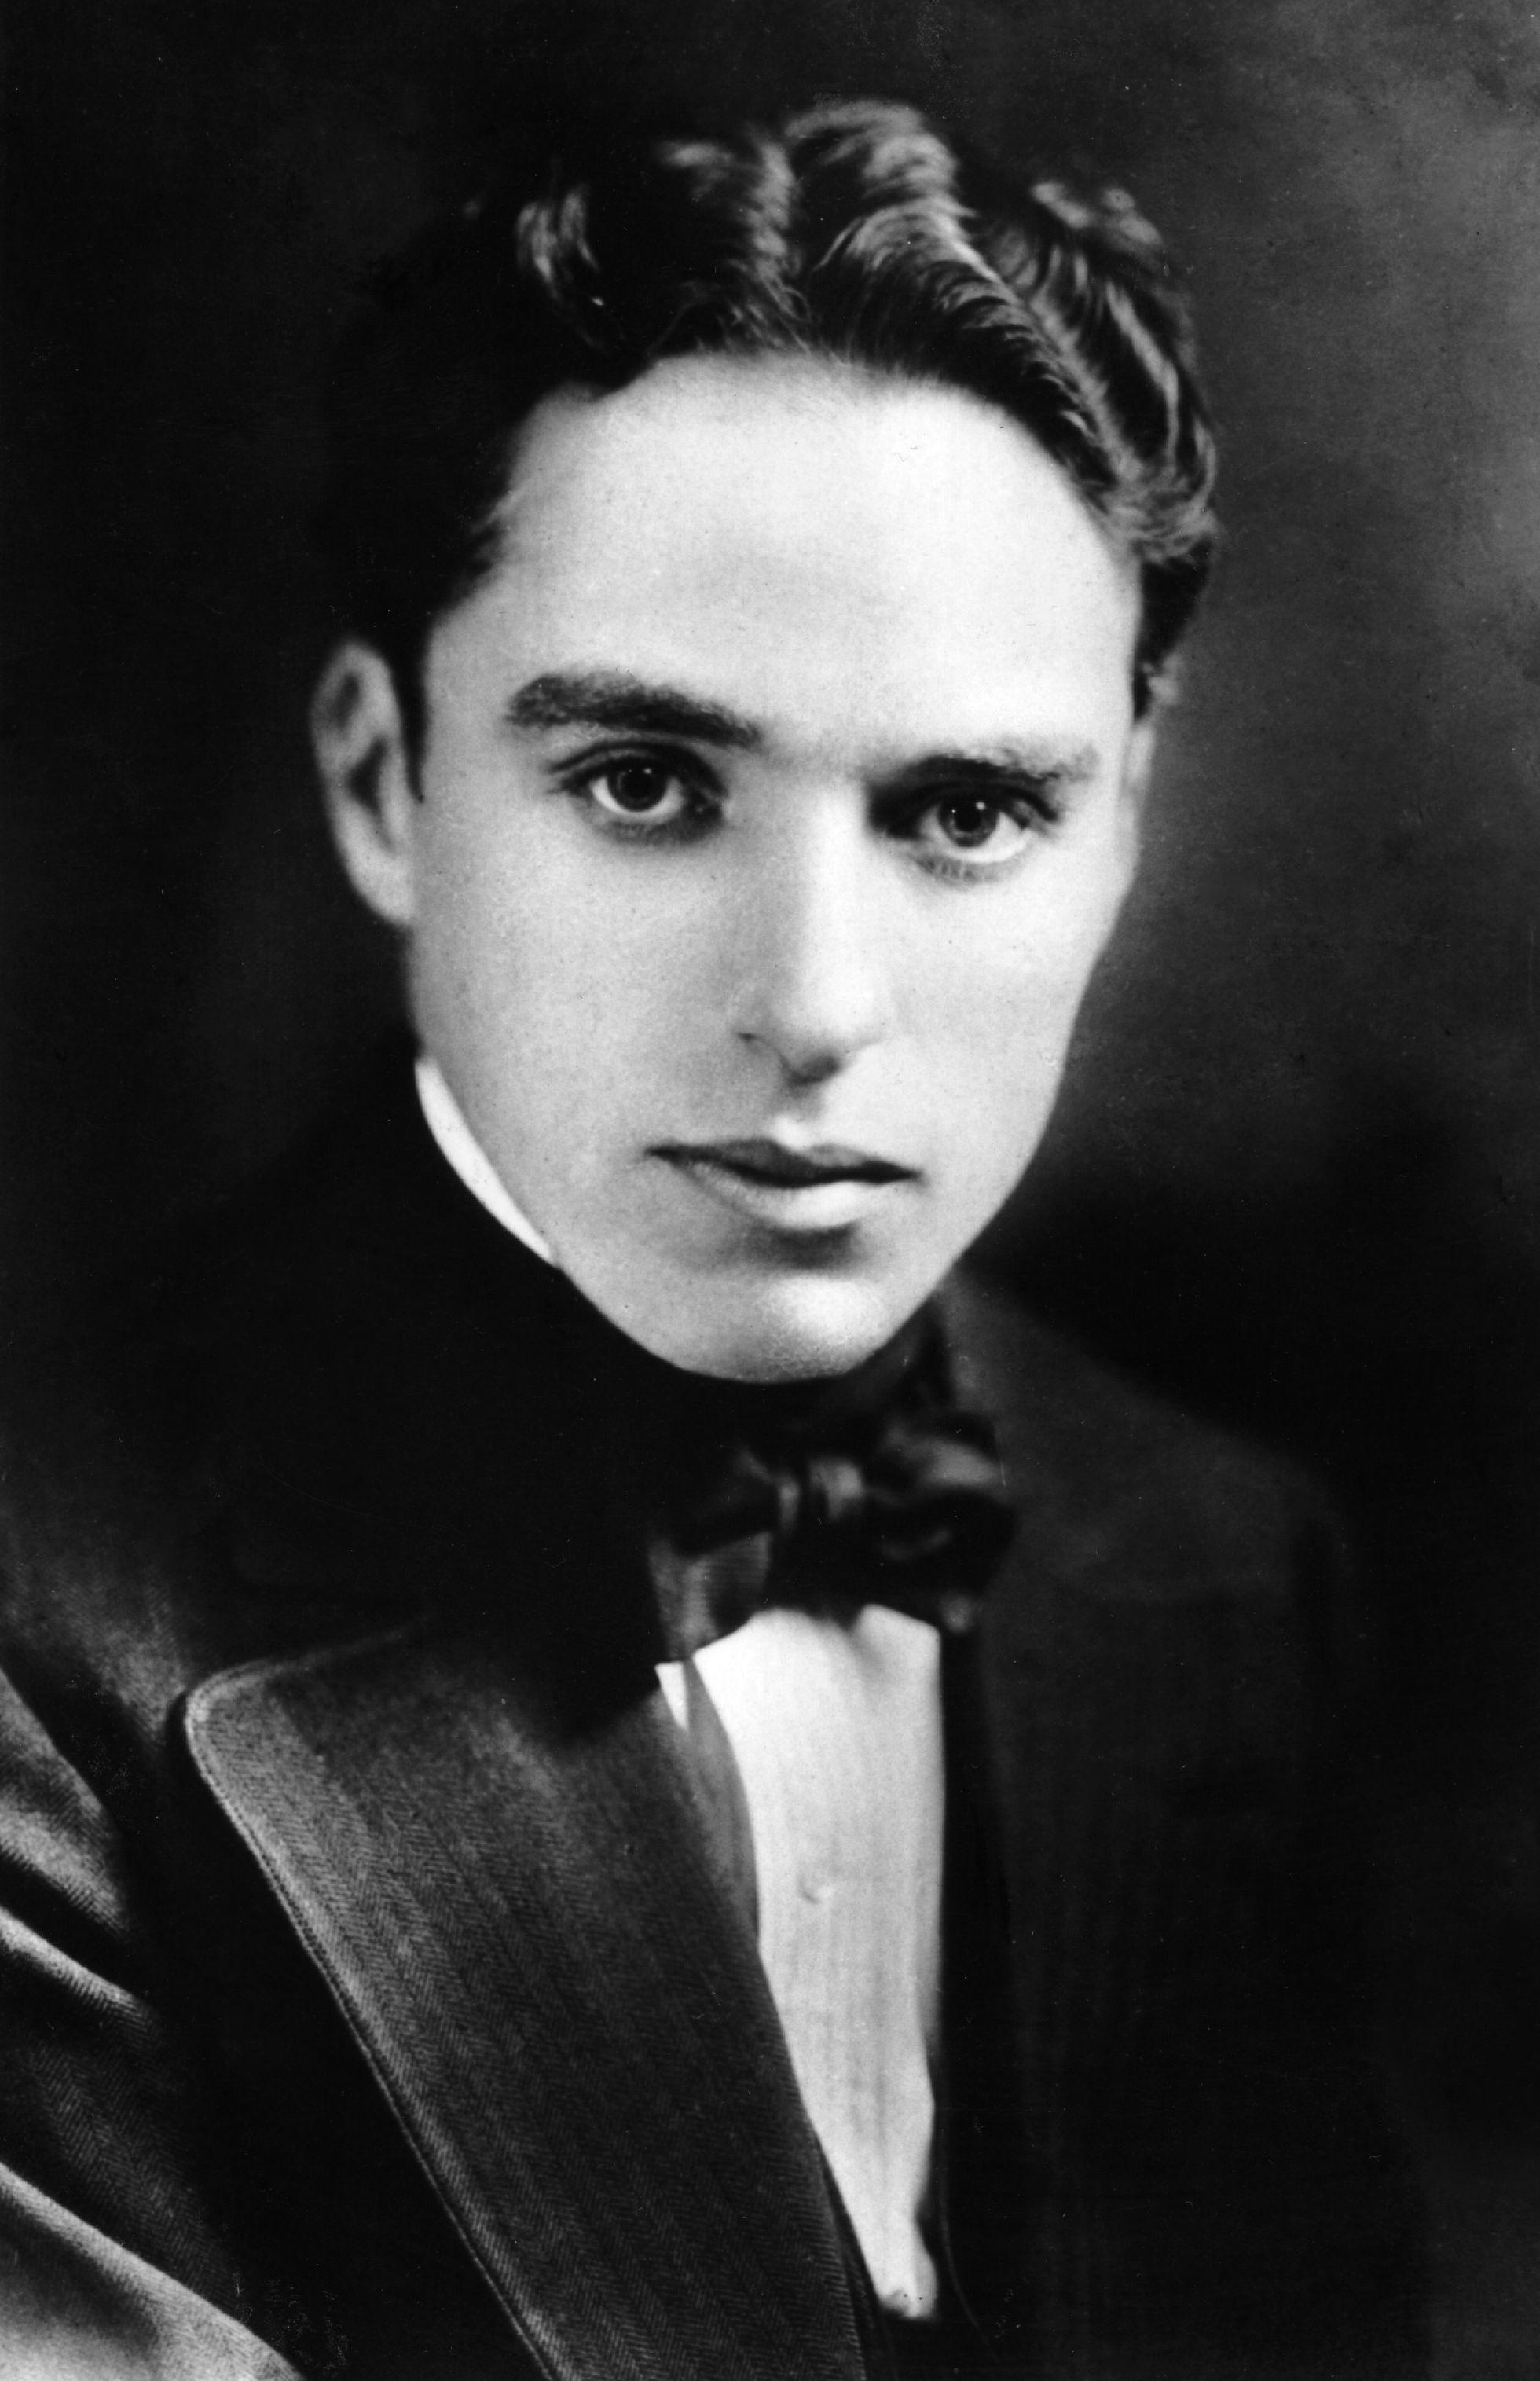 Dmitry Chaplin dating någon